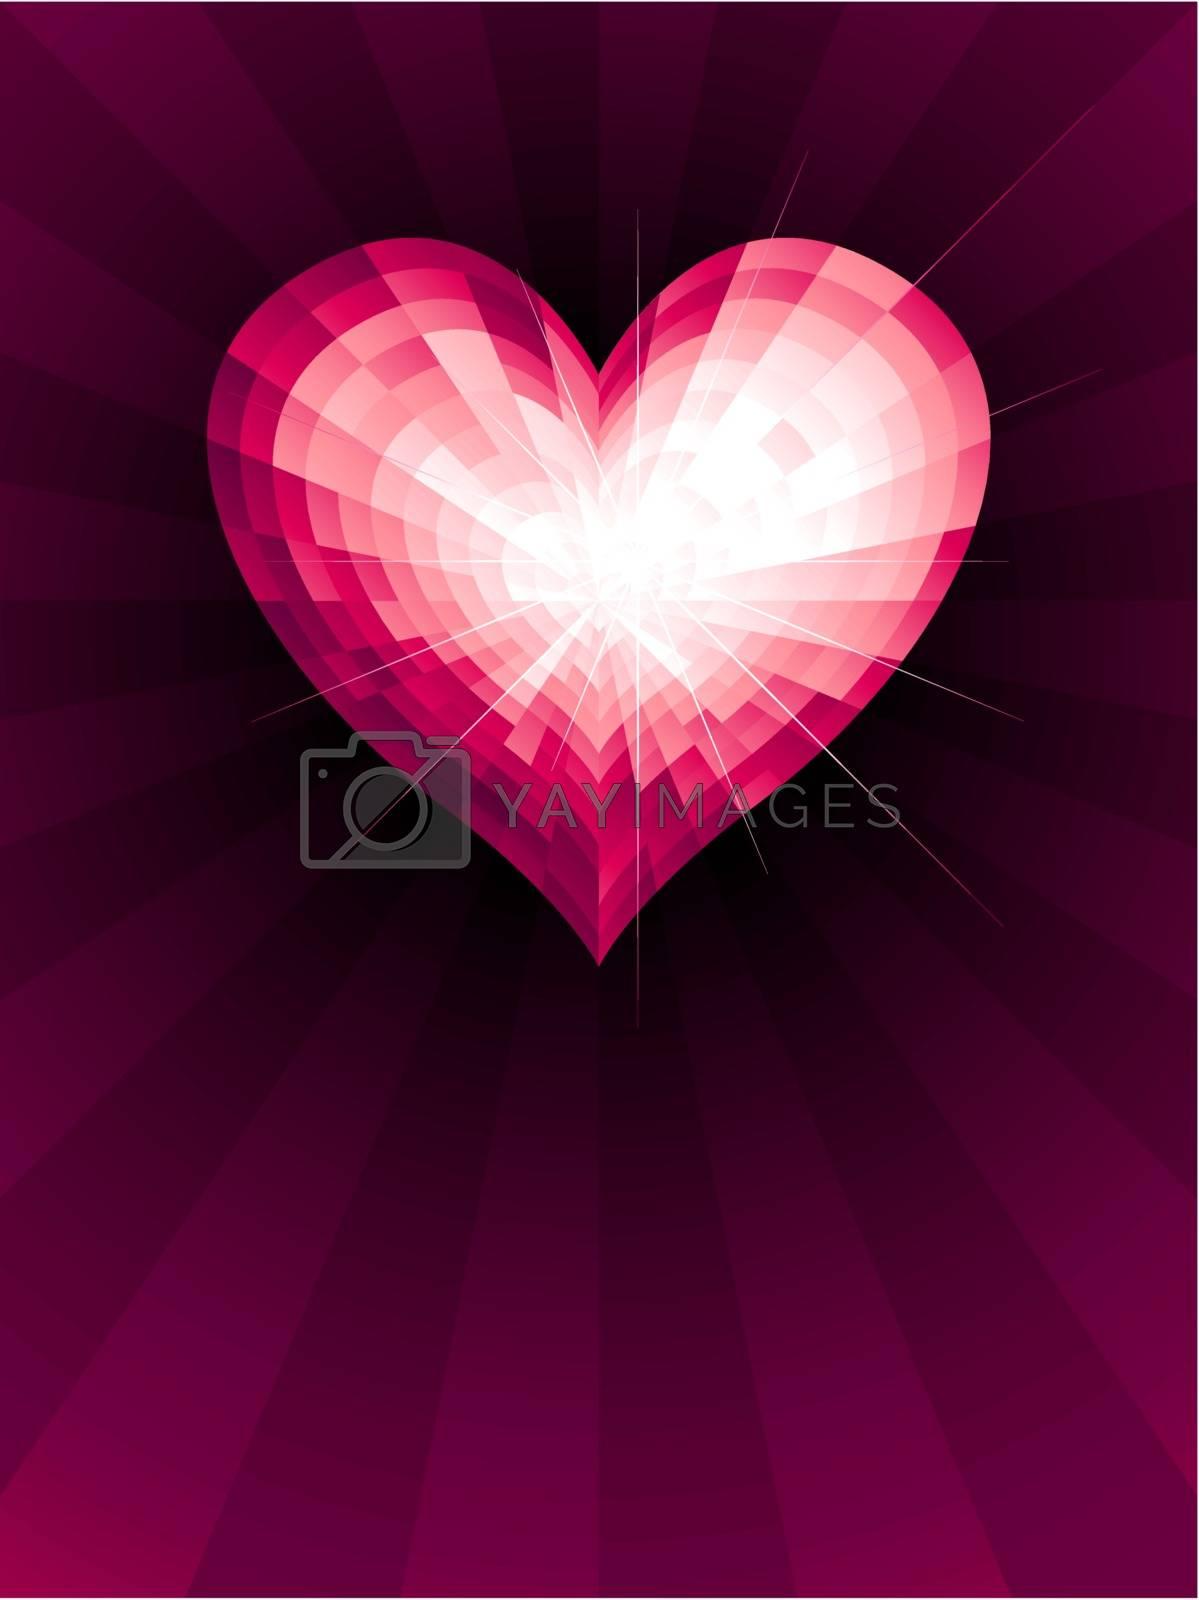 Crystal heart. Eps8. RGB. Global colors. Gradients used